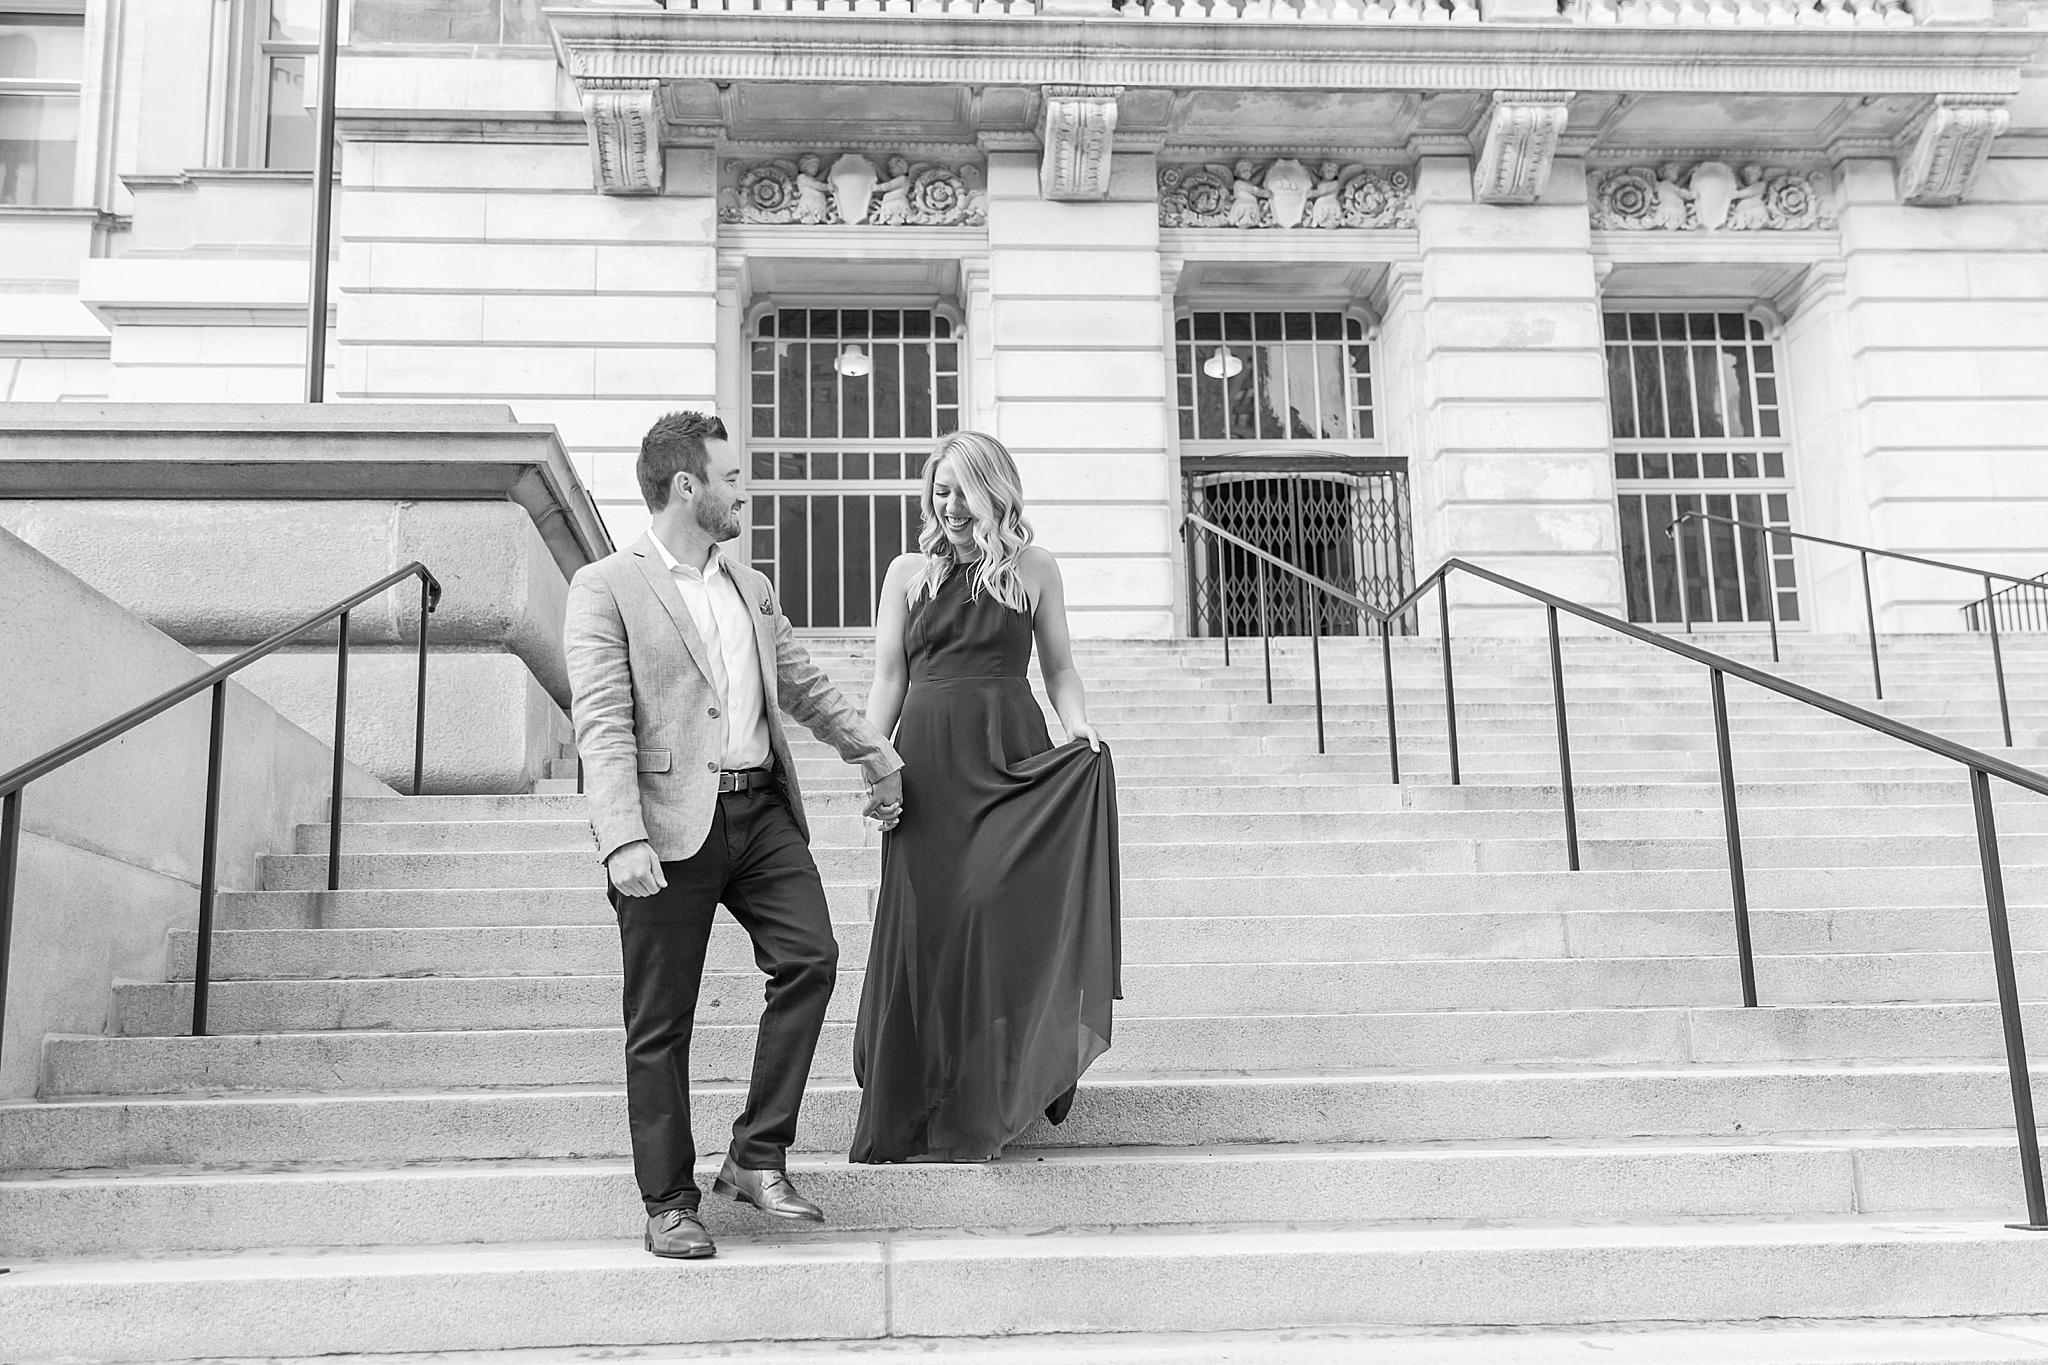 detroit-wedding-photographer-downtown-detroit-belle-isle-engagement-photos-sarah-eric-by-courtney-carolyn-photography_0036.jpg